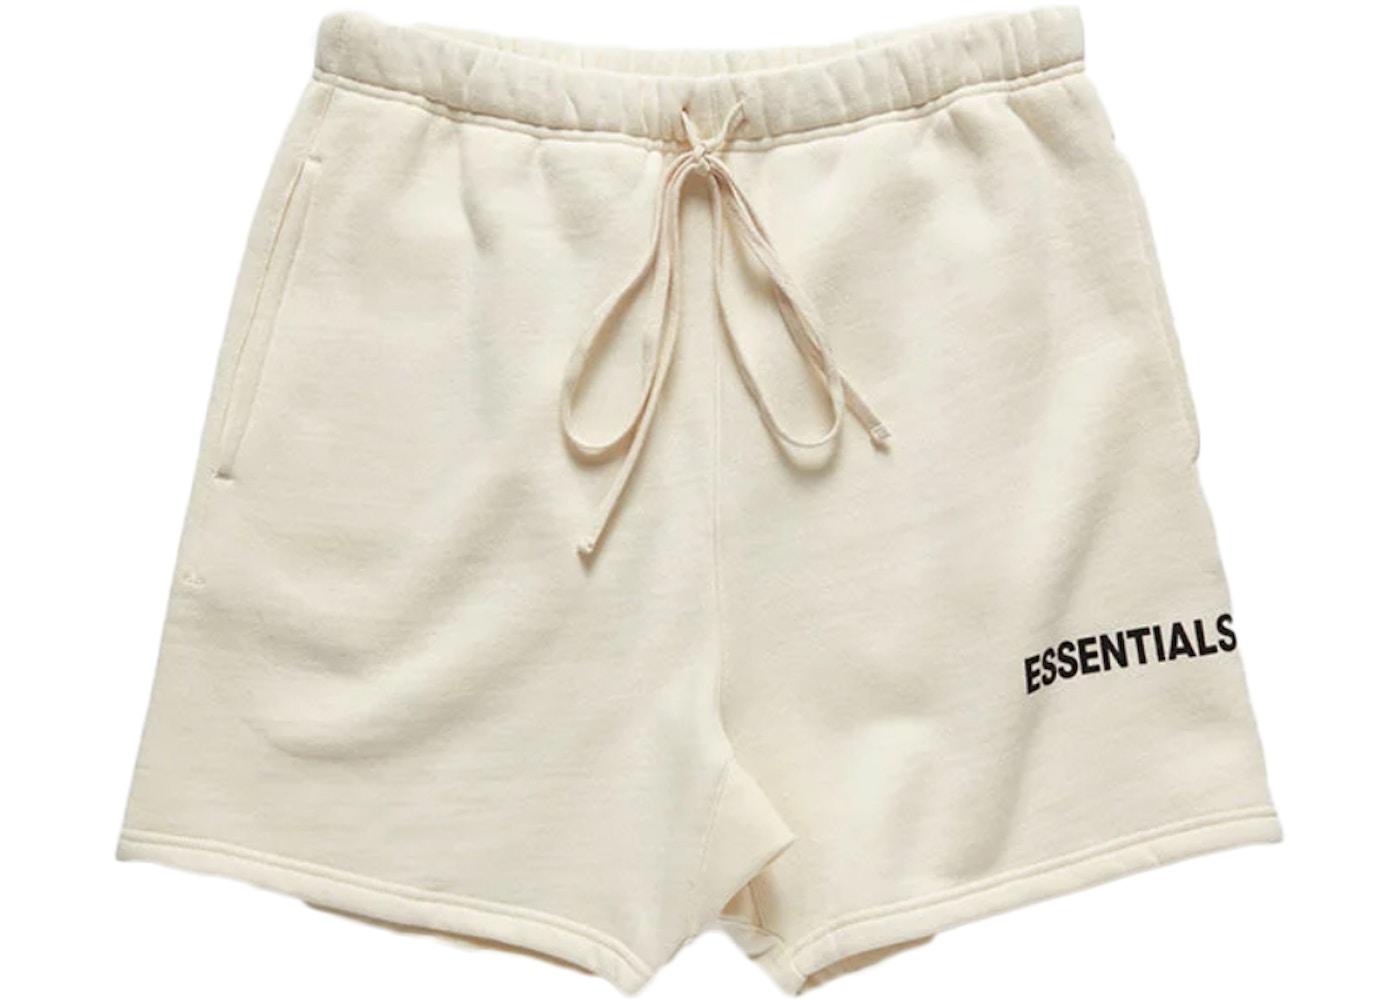 d014cae7 FEAR OF GOD Essentials Graphic Sweat Shorts Cream - Essentials